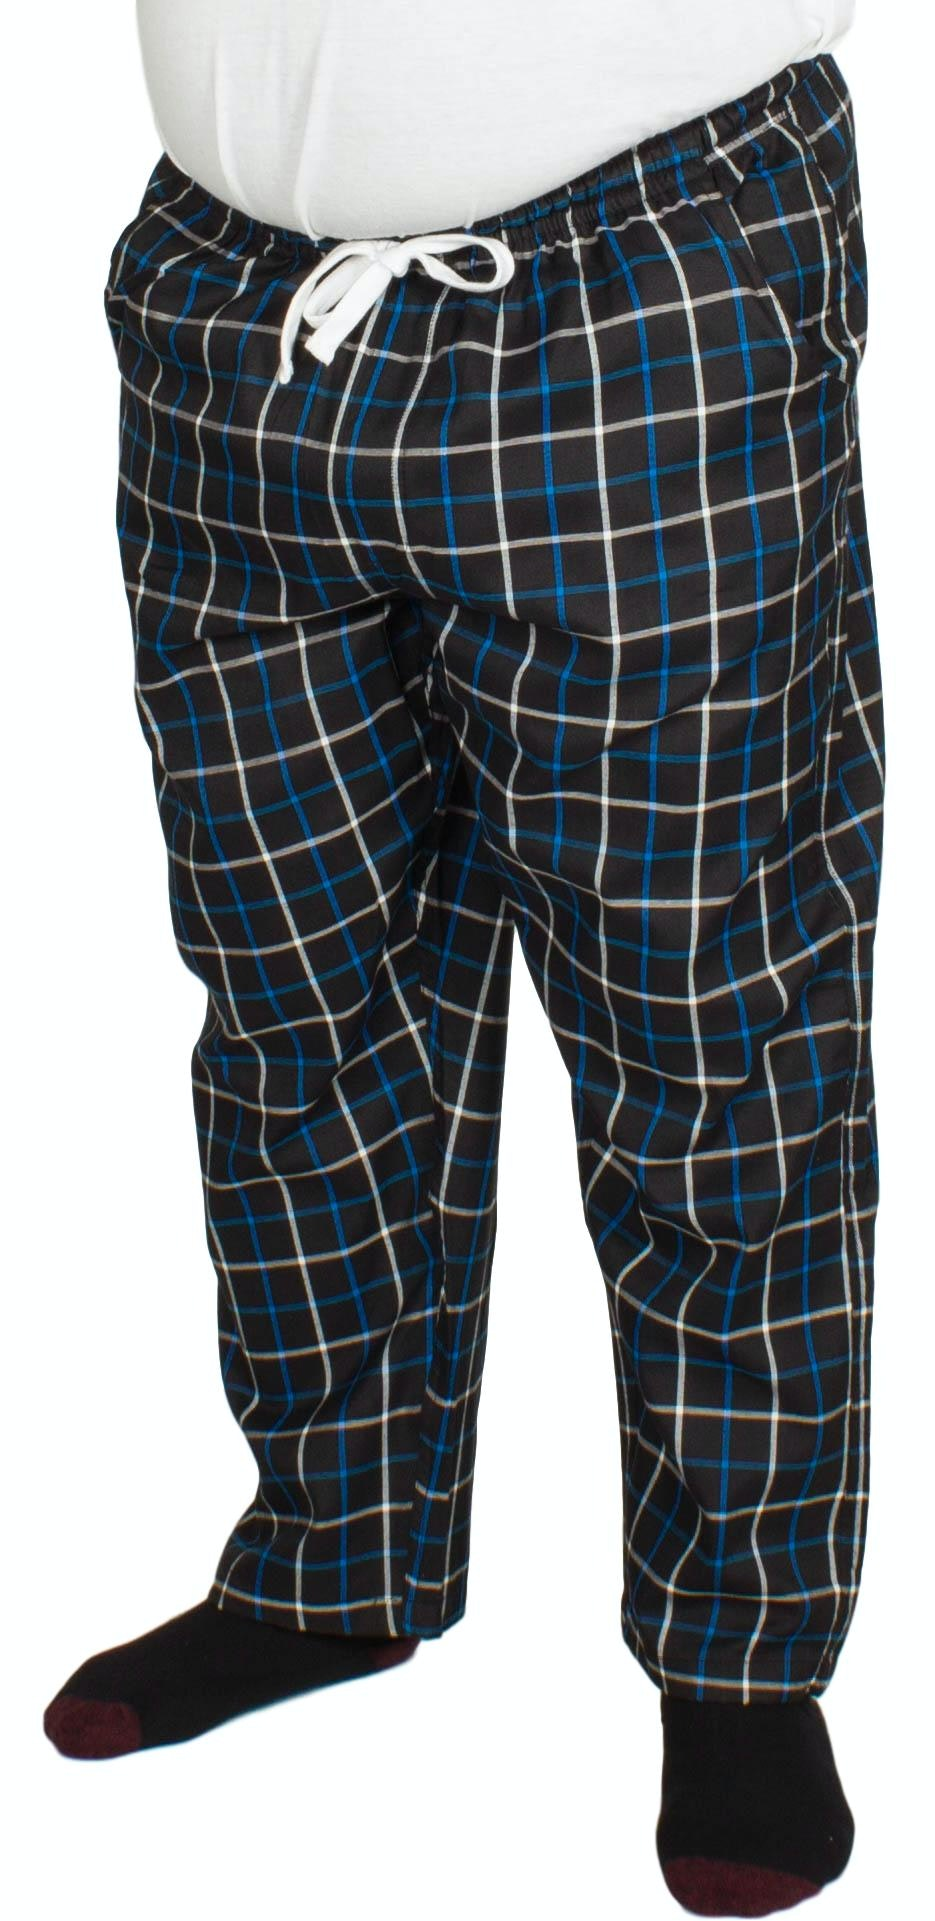 Bigdude Modern Check Lounge Pants Black/Blue